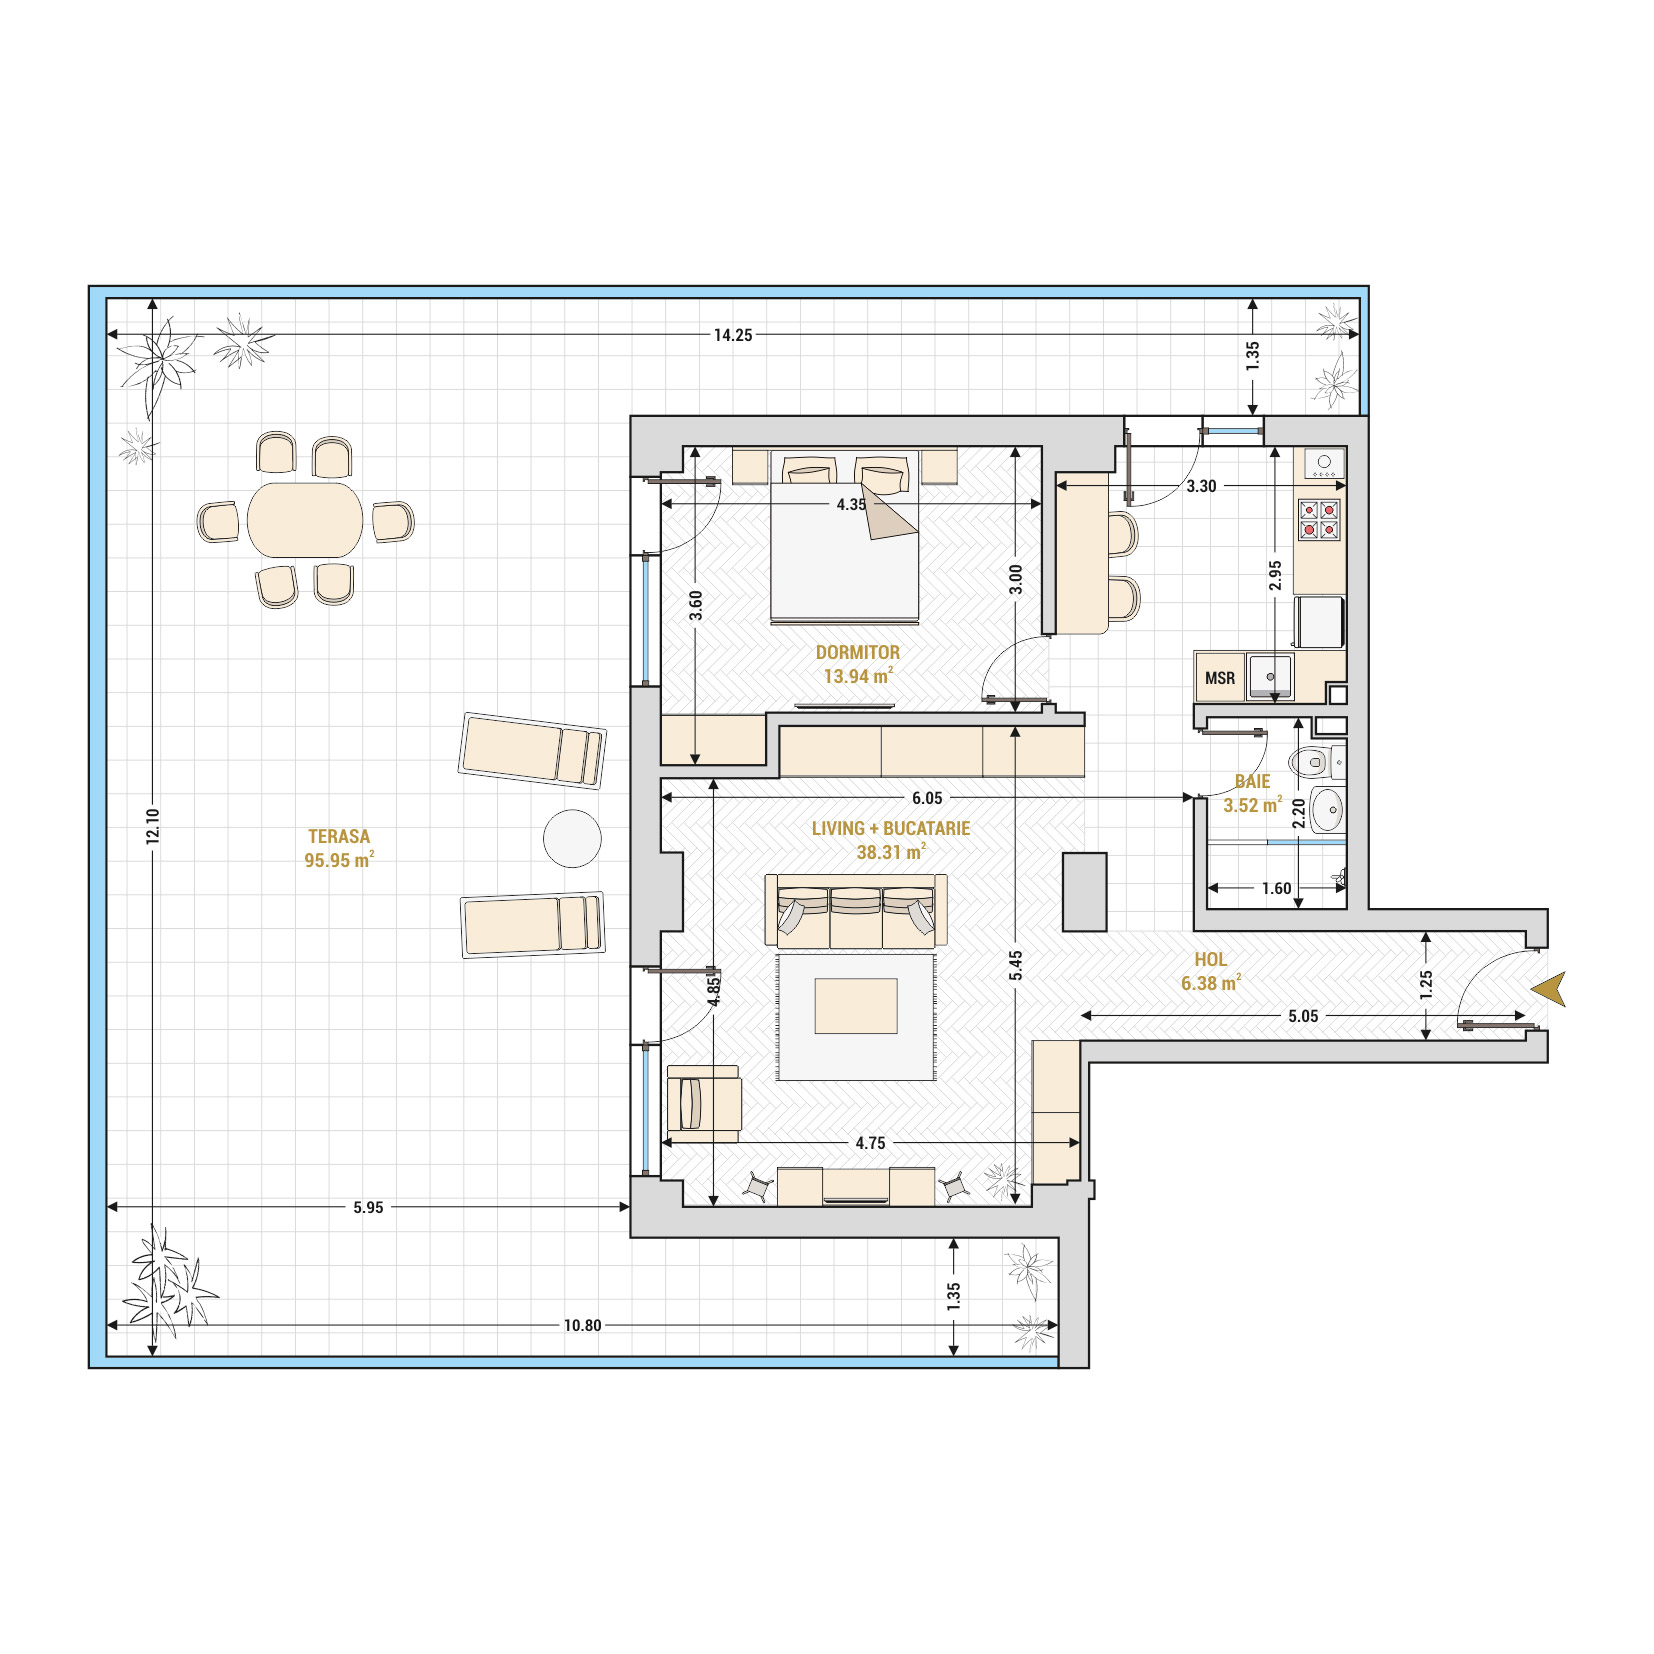 Apartamente cu 2 camere de vanzare Bucuresti - Catedral Residence - Marriott, Piata Unirii, 13 Septembrie, Izvor - Tip 10 - T1A